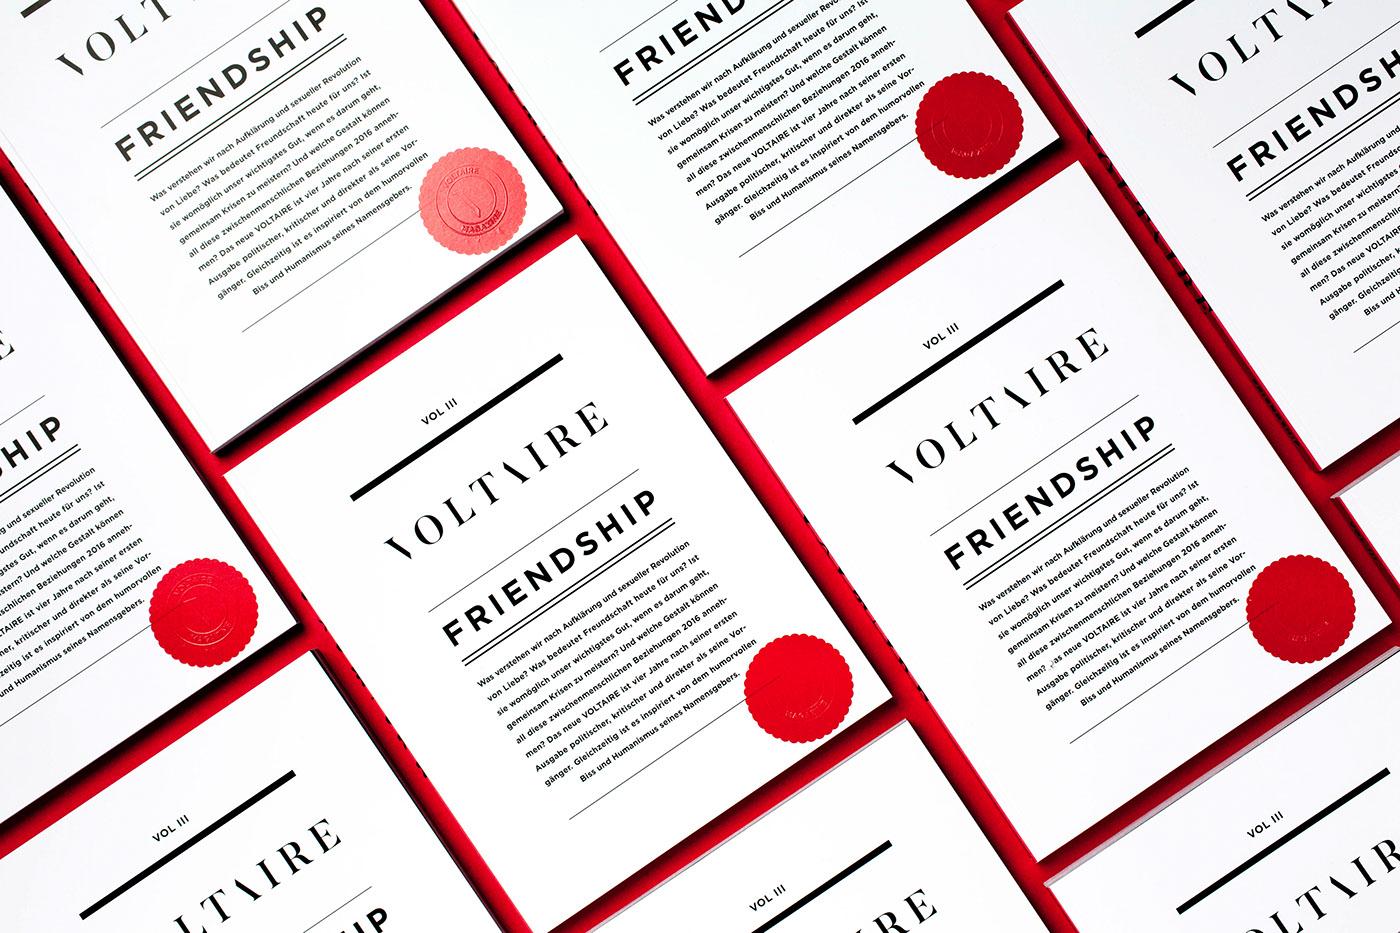 magazine editorial friendship Voltaire typography   Photography  studentwork Hochschulmagazin print Collaboration